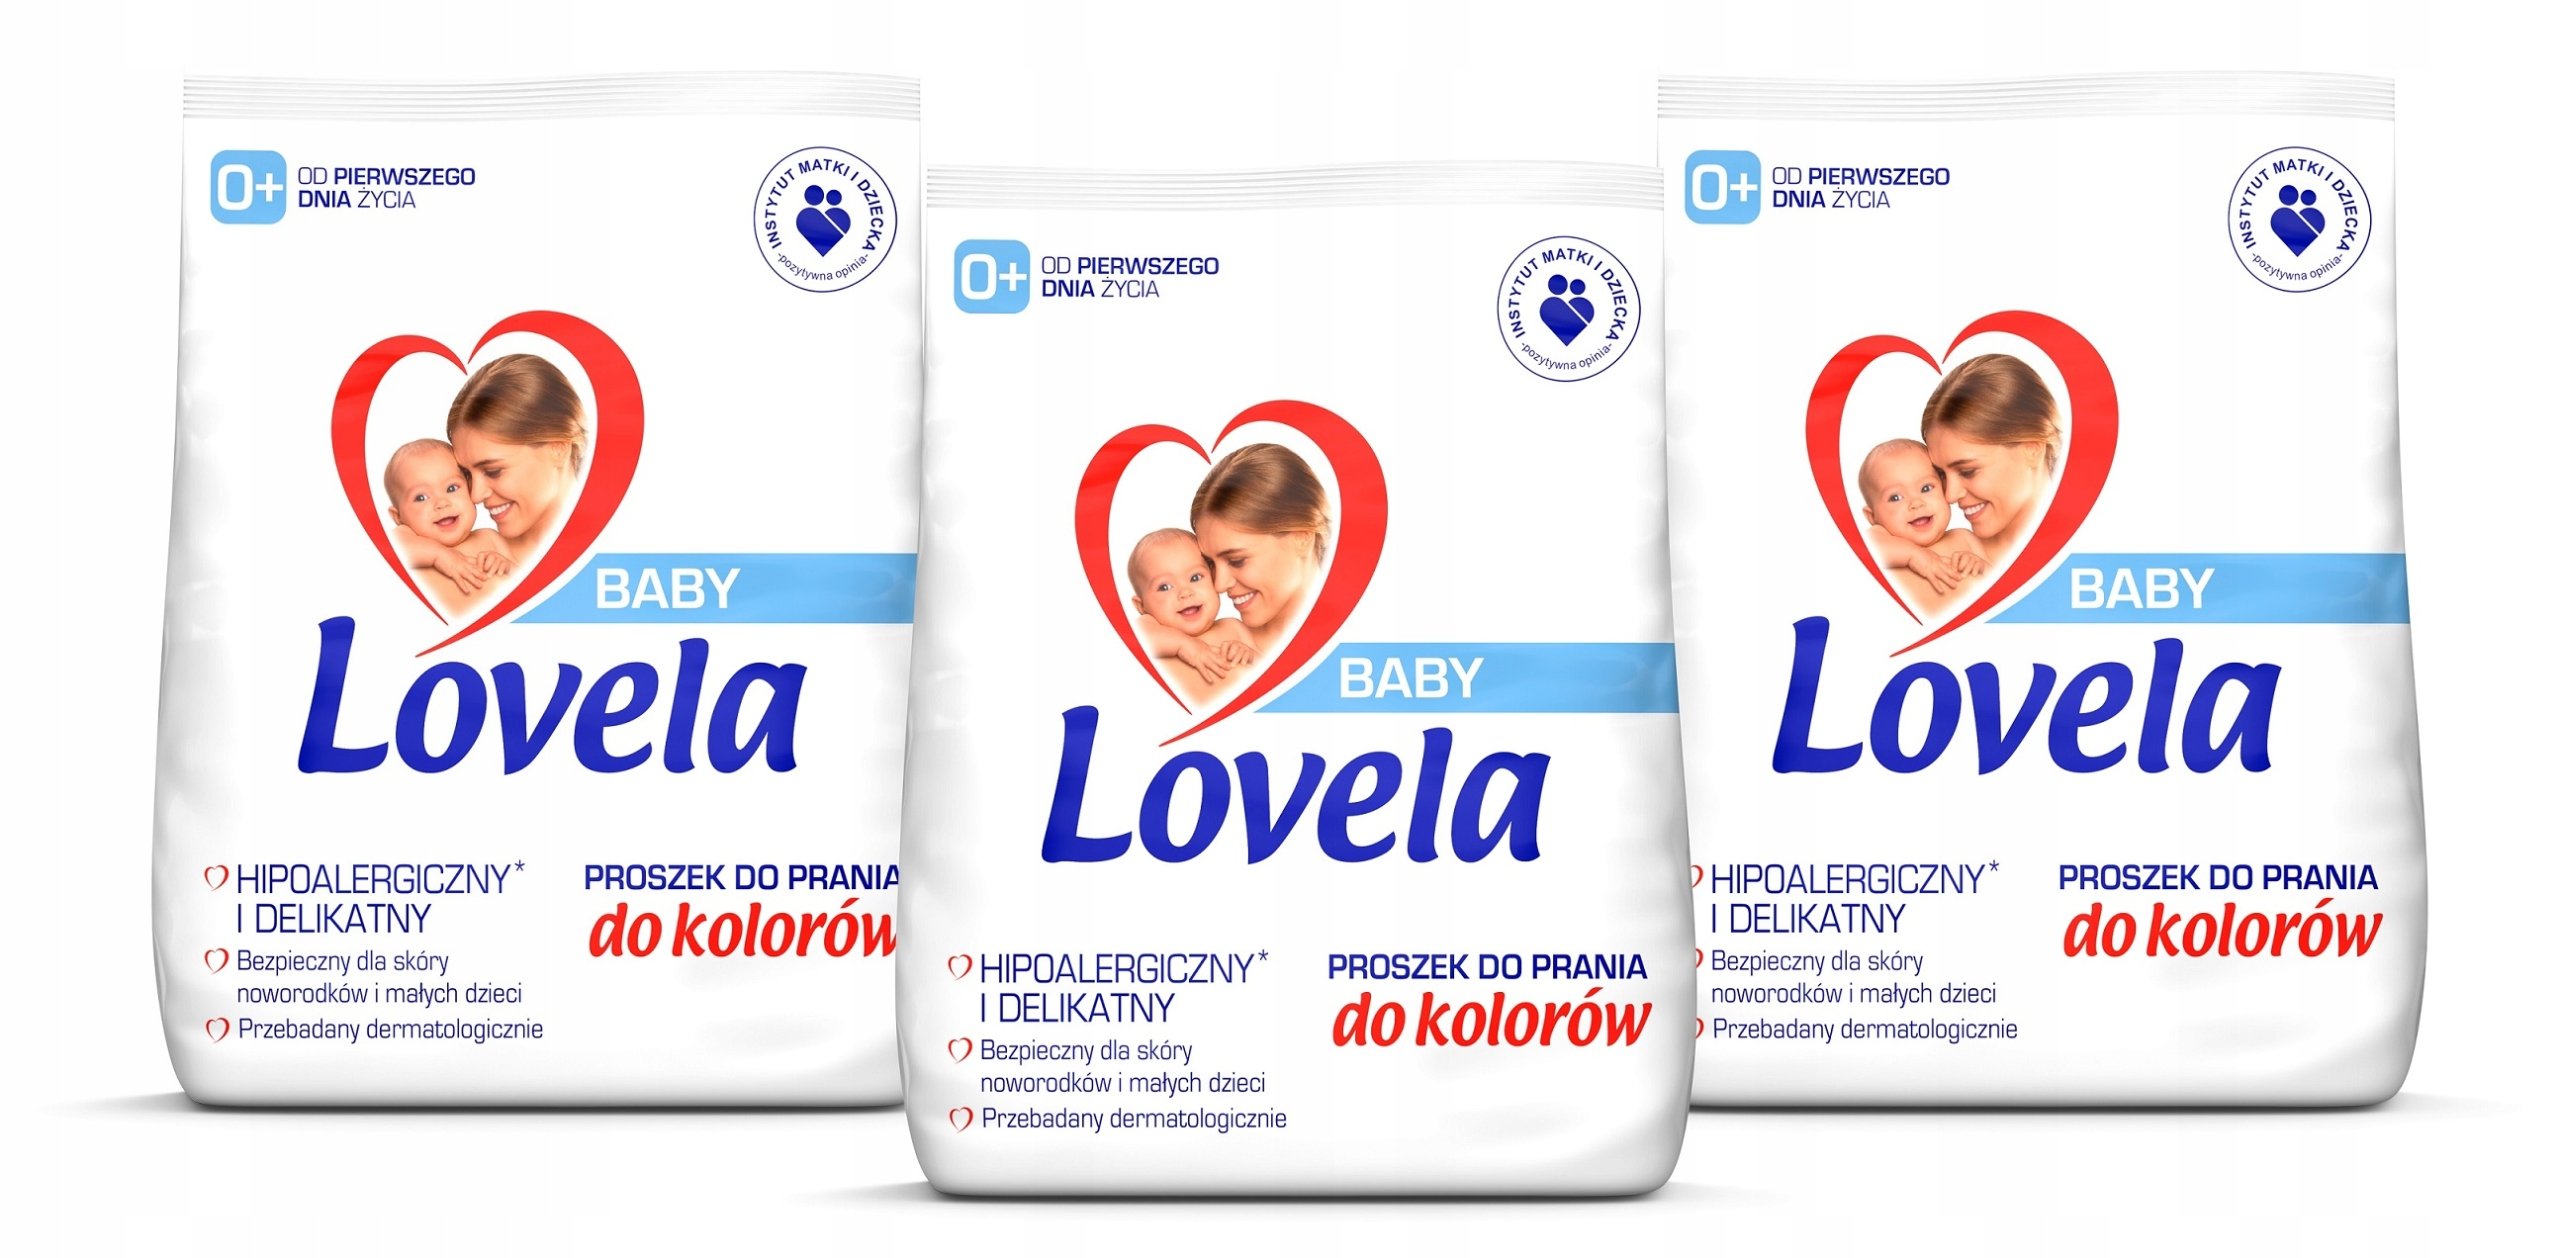 Lovela Baby Powder 3x2.7kg/81pr Цвет